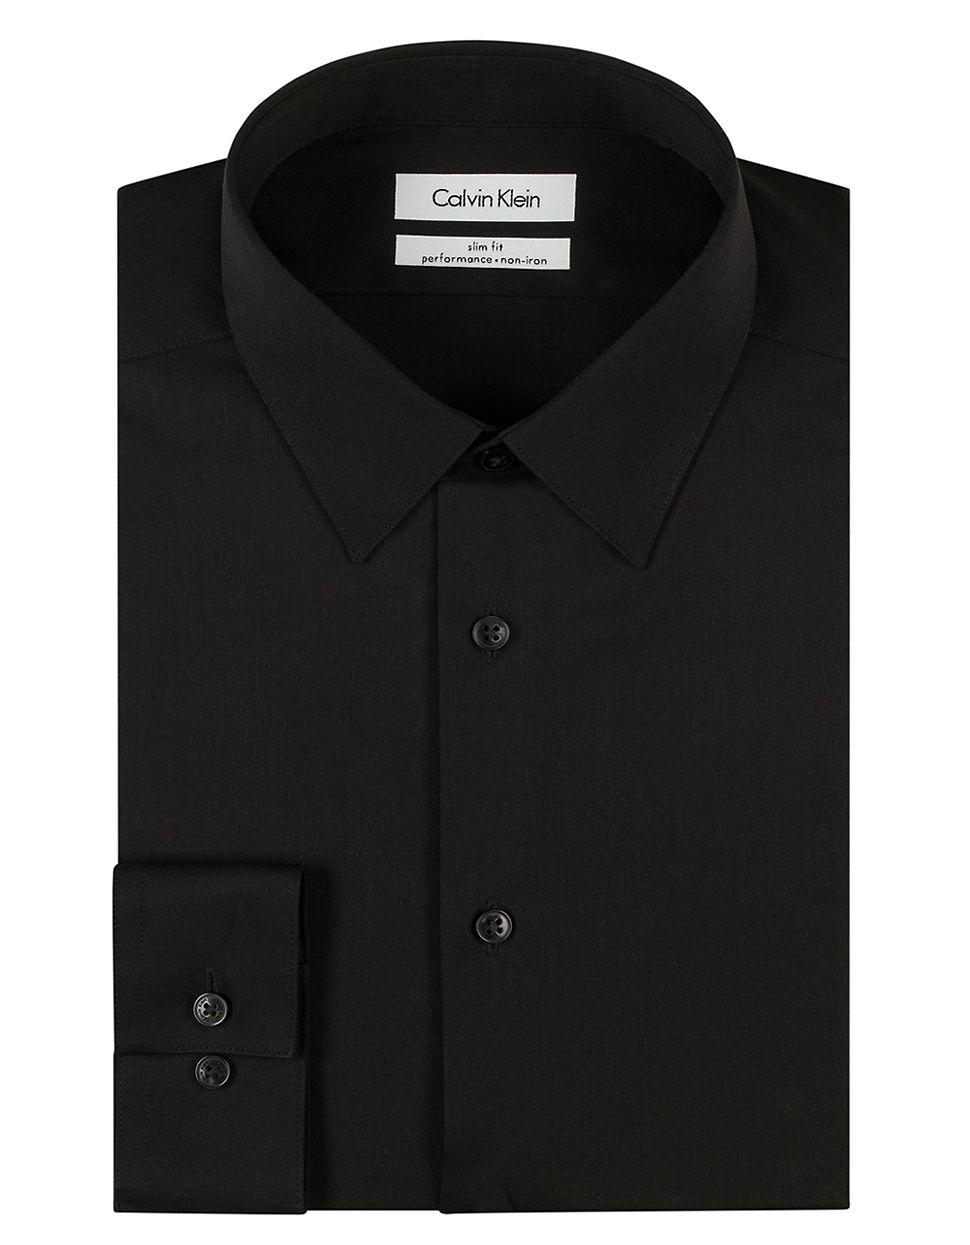 Lyst Calvin Klein Slim Fit Dress Shirt In Black For Men